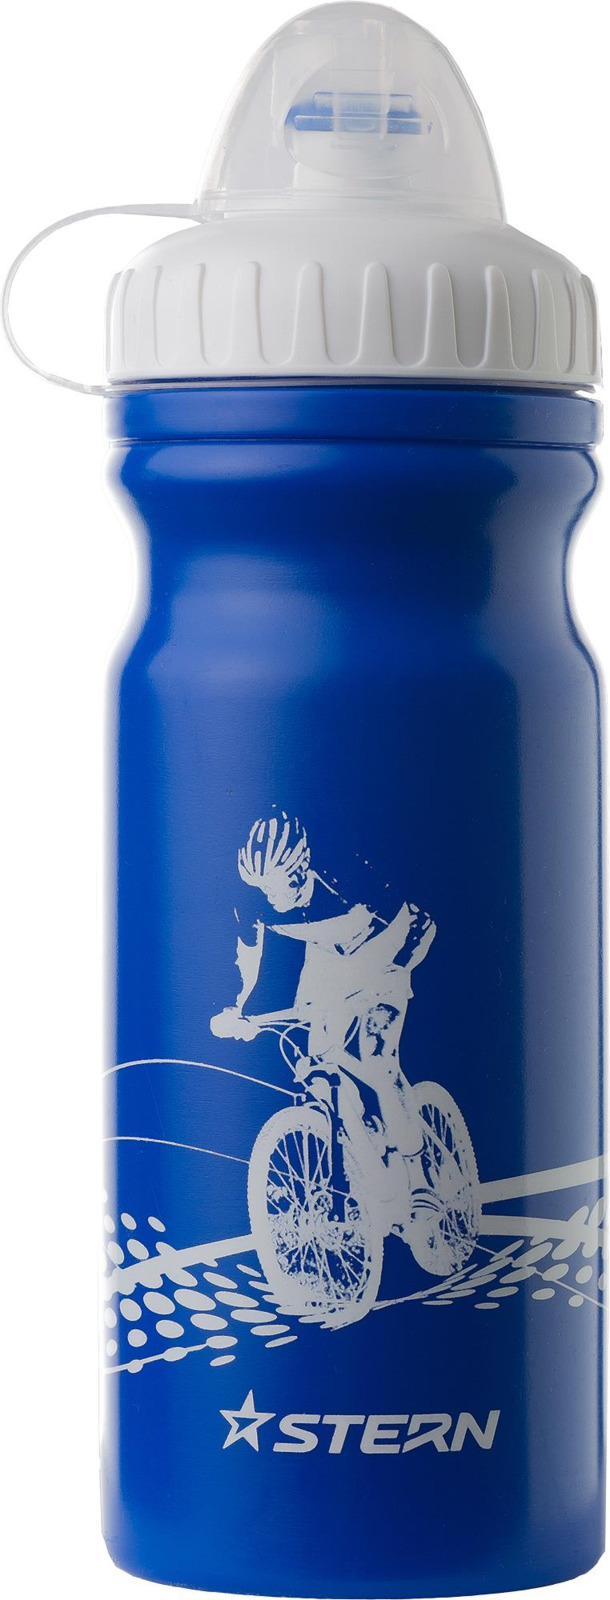 Фляга велосипедная Stern 01 CBOT-1 Water bottle, синий недорого